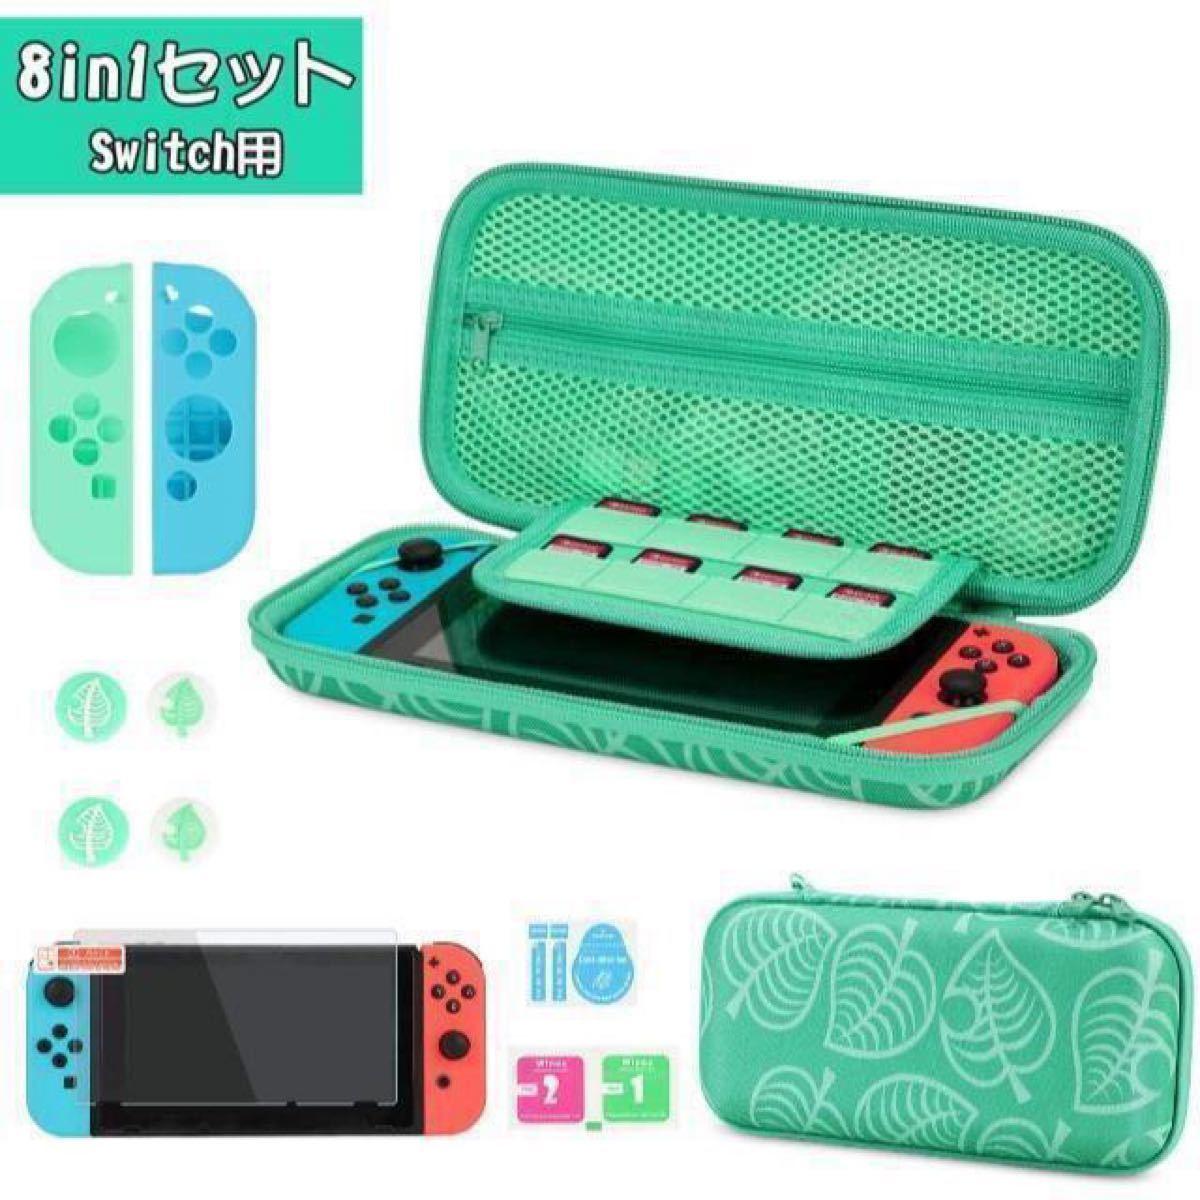 Nintendo Switch 任天堂スイッチケース ニンテンドースイッチ 保護カバー